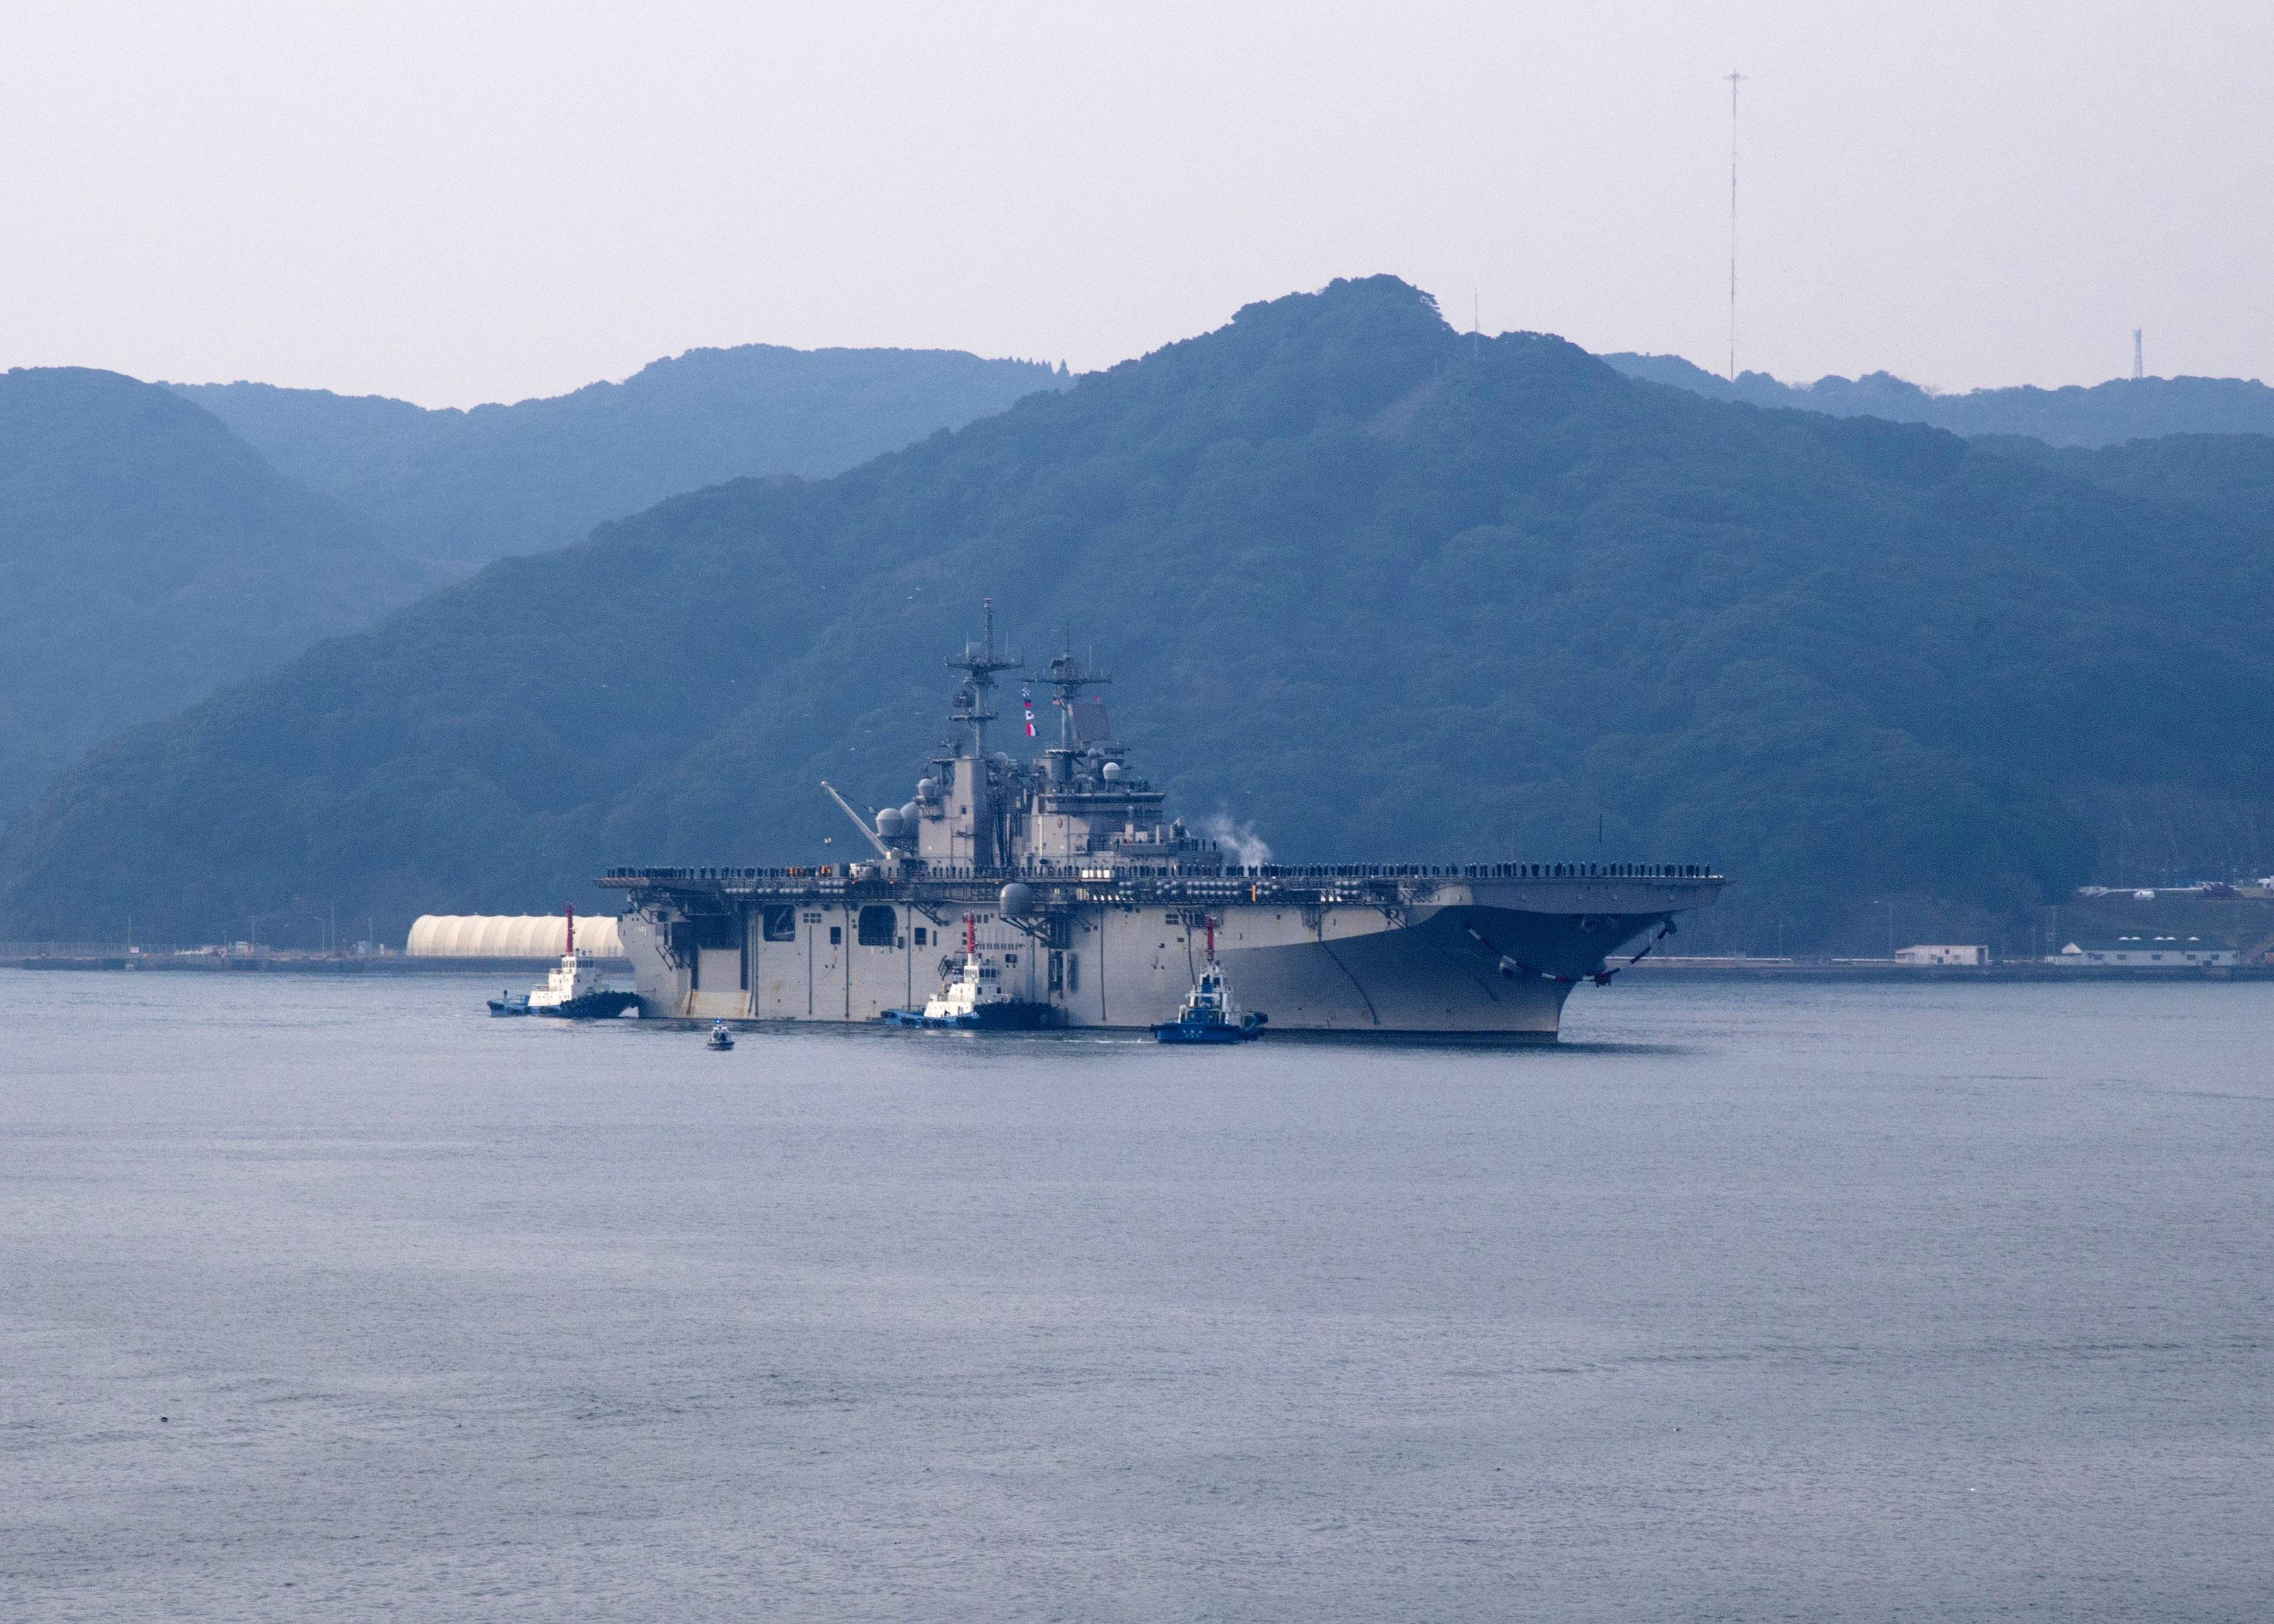 Amphibious assault ship (LHA - LHD - LPD) - Page 5 38791838805_f2600e2955_o